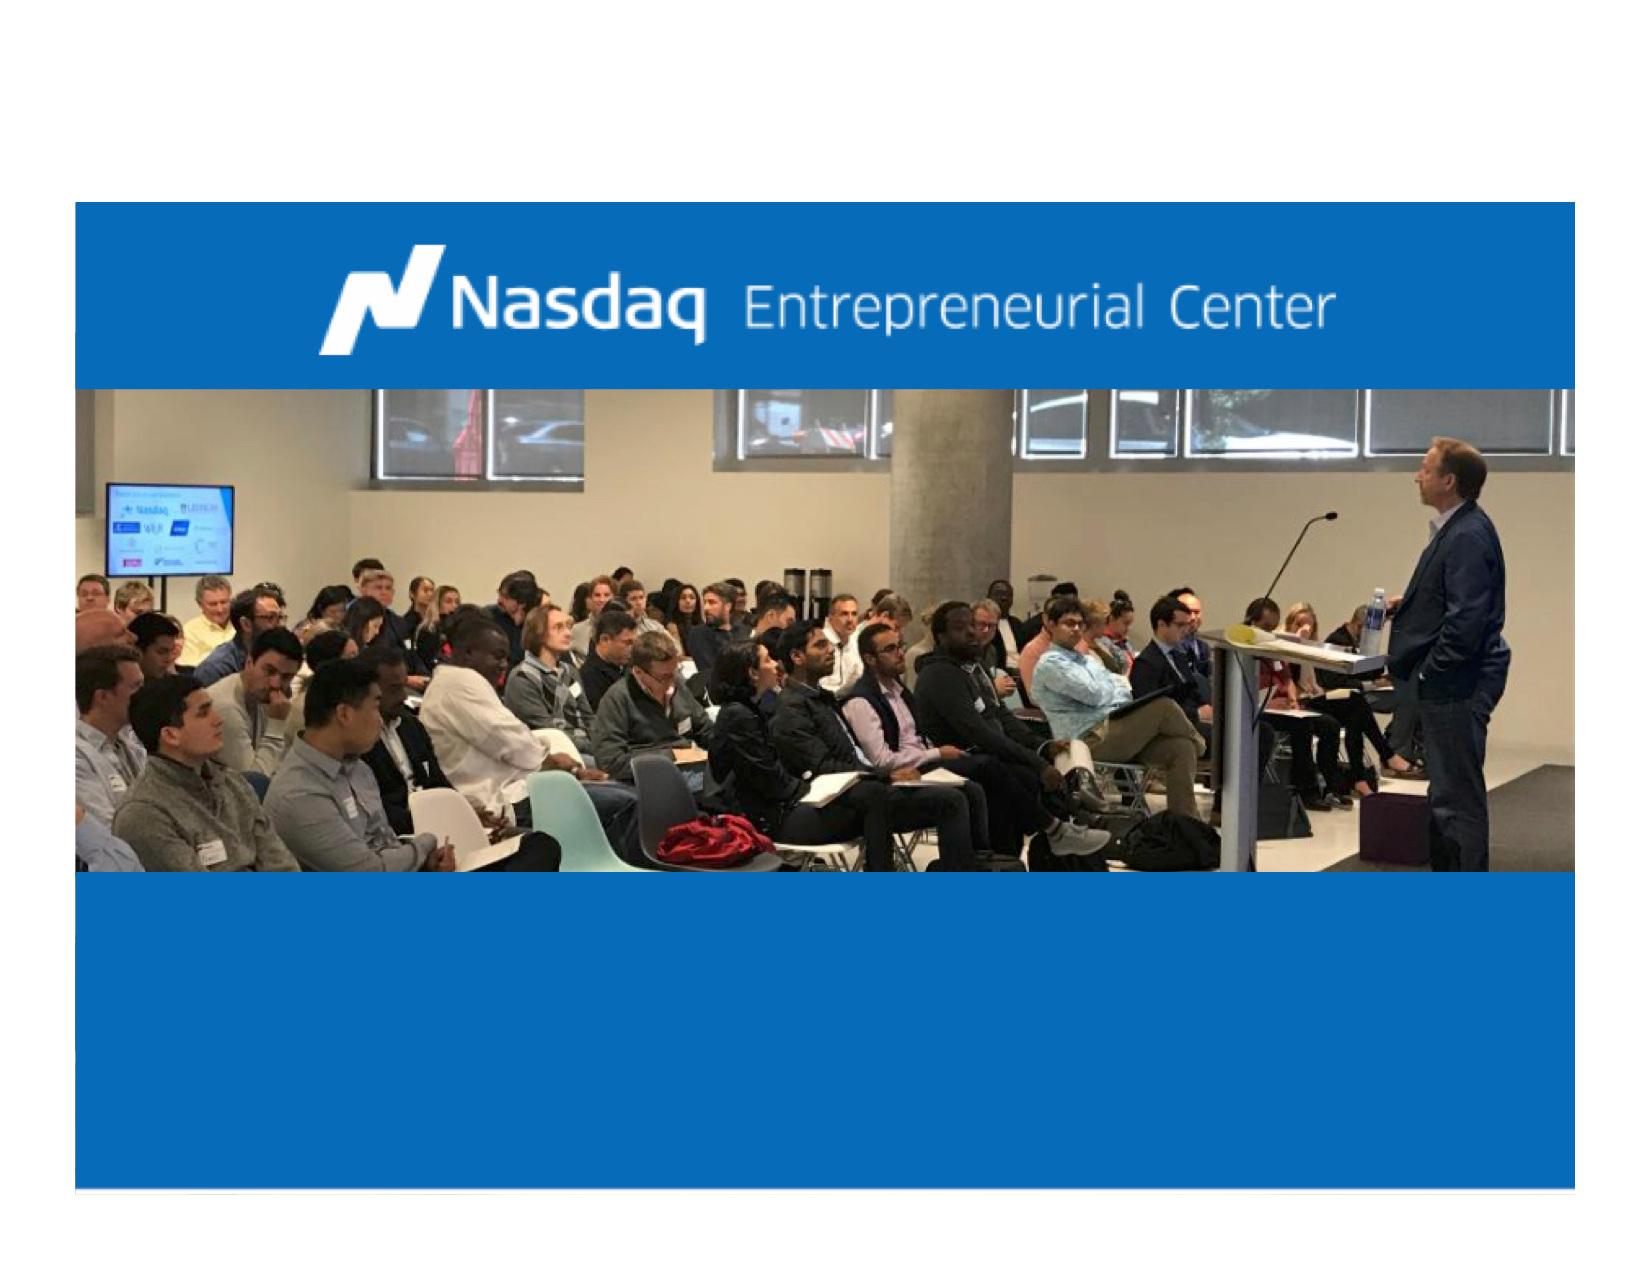 NASDAQ Speaking image overlay.jpg